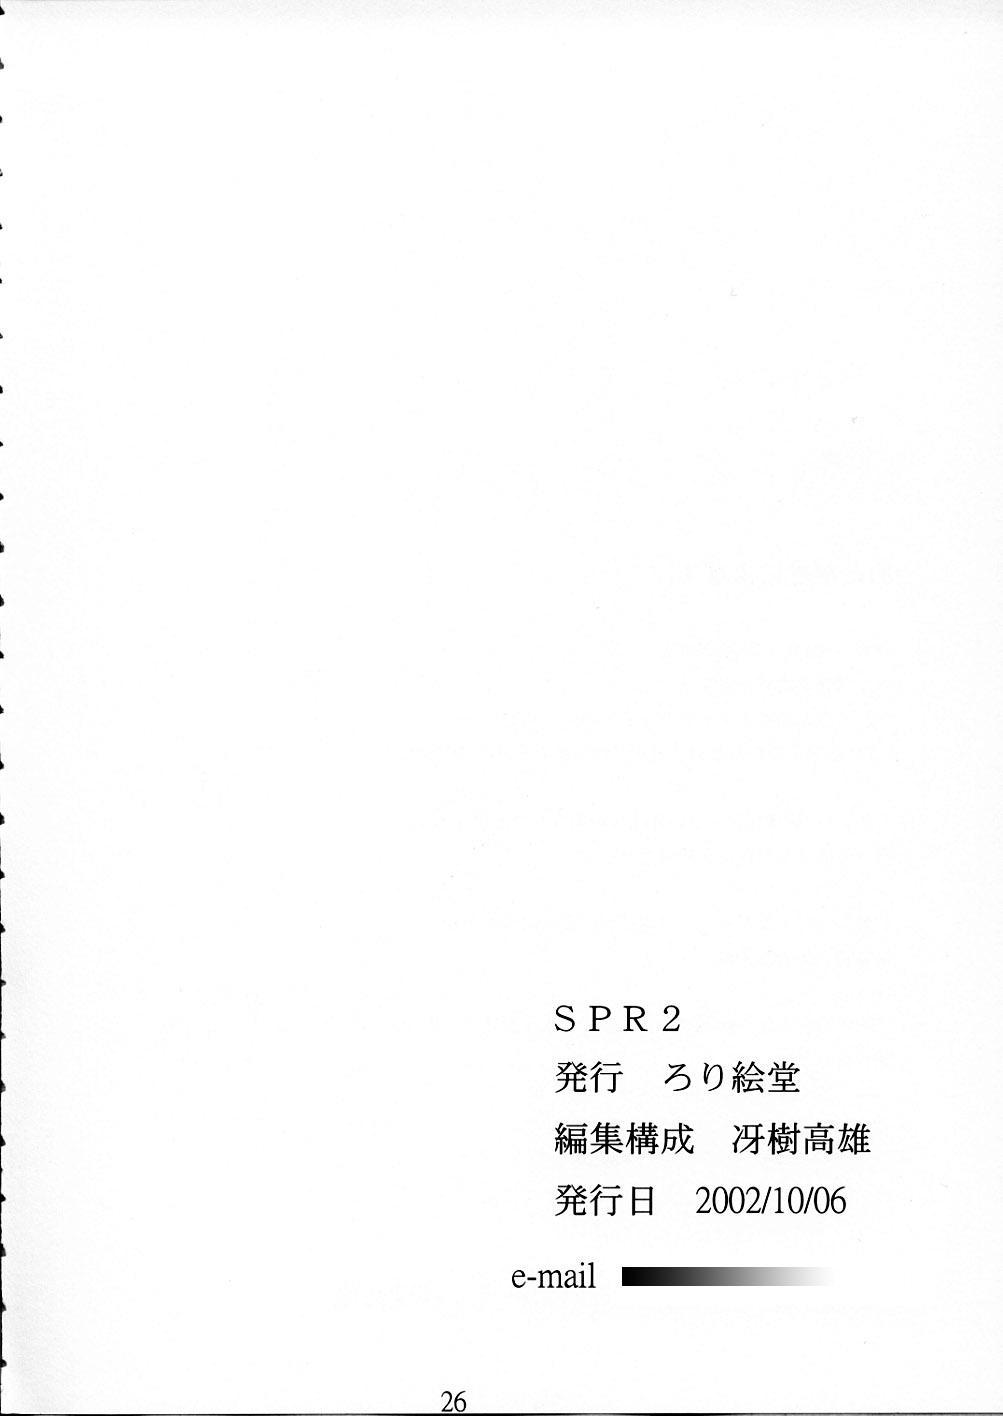 SPR2 24